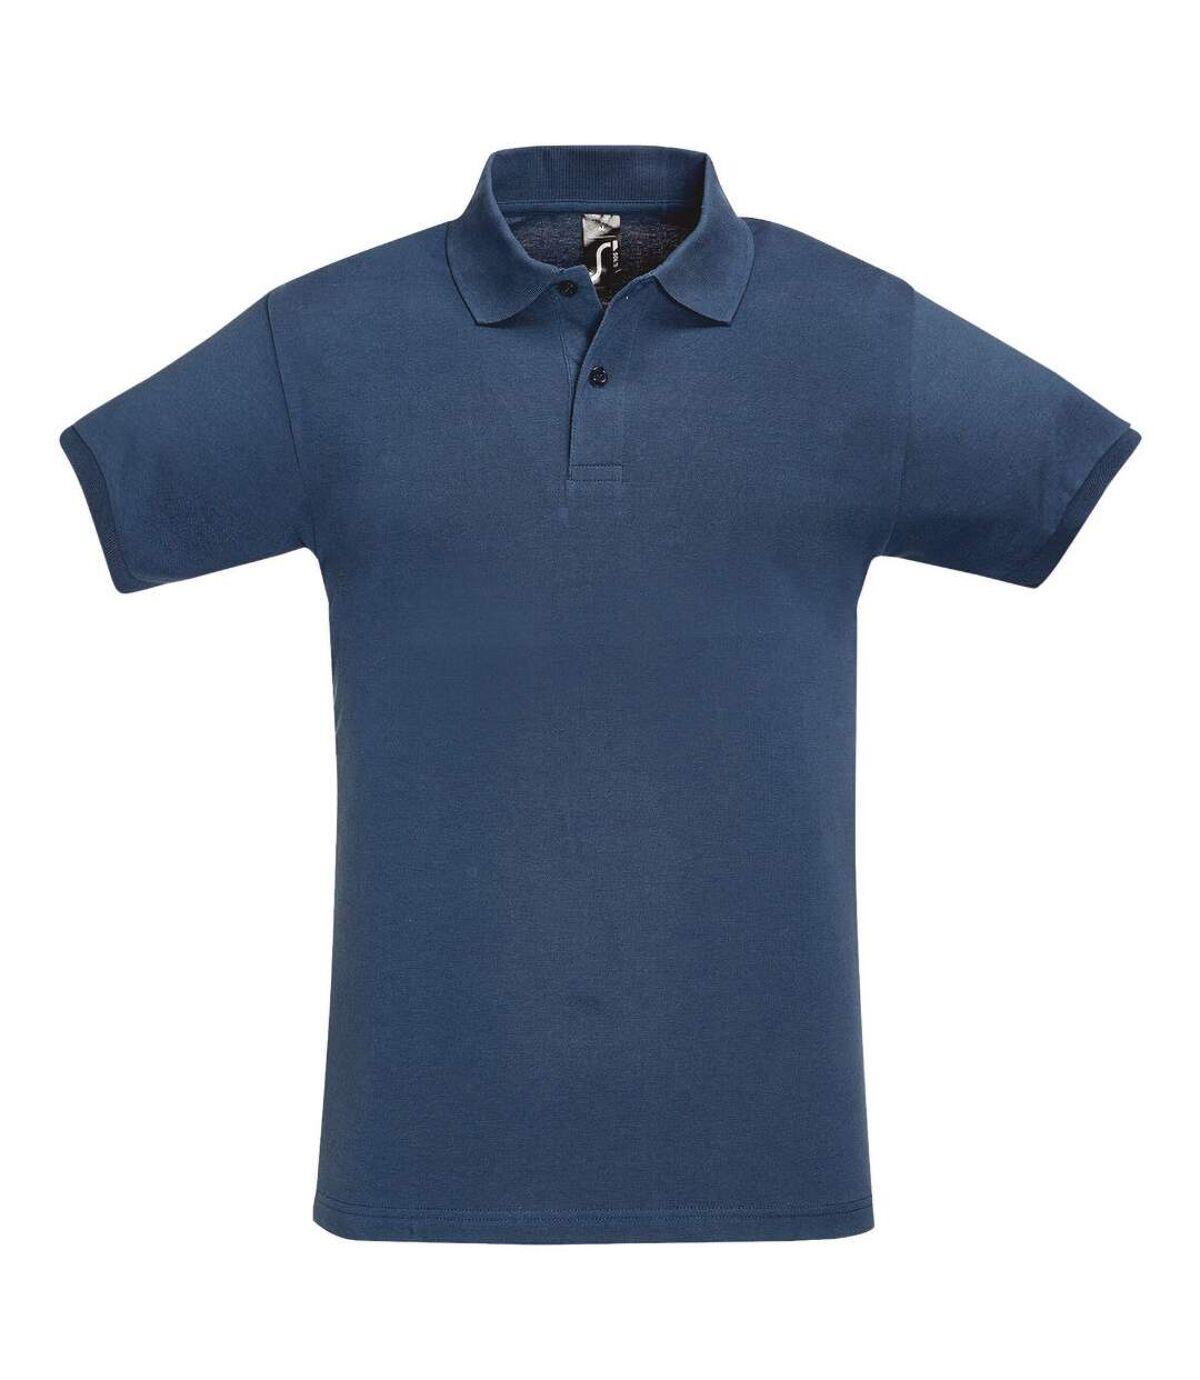 SOLS Mens Perfect Pique Short Sleeve Polo Shirt (Denim) - UTPC283